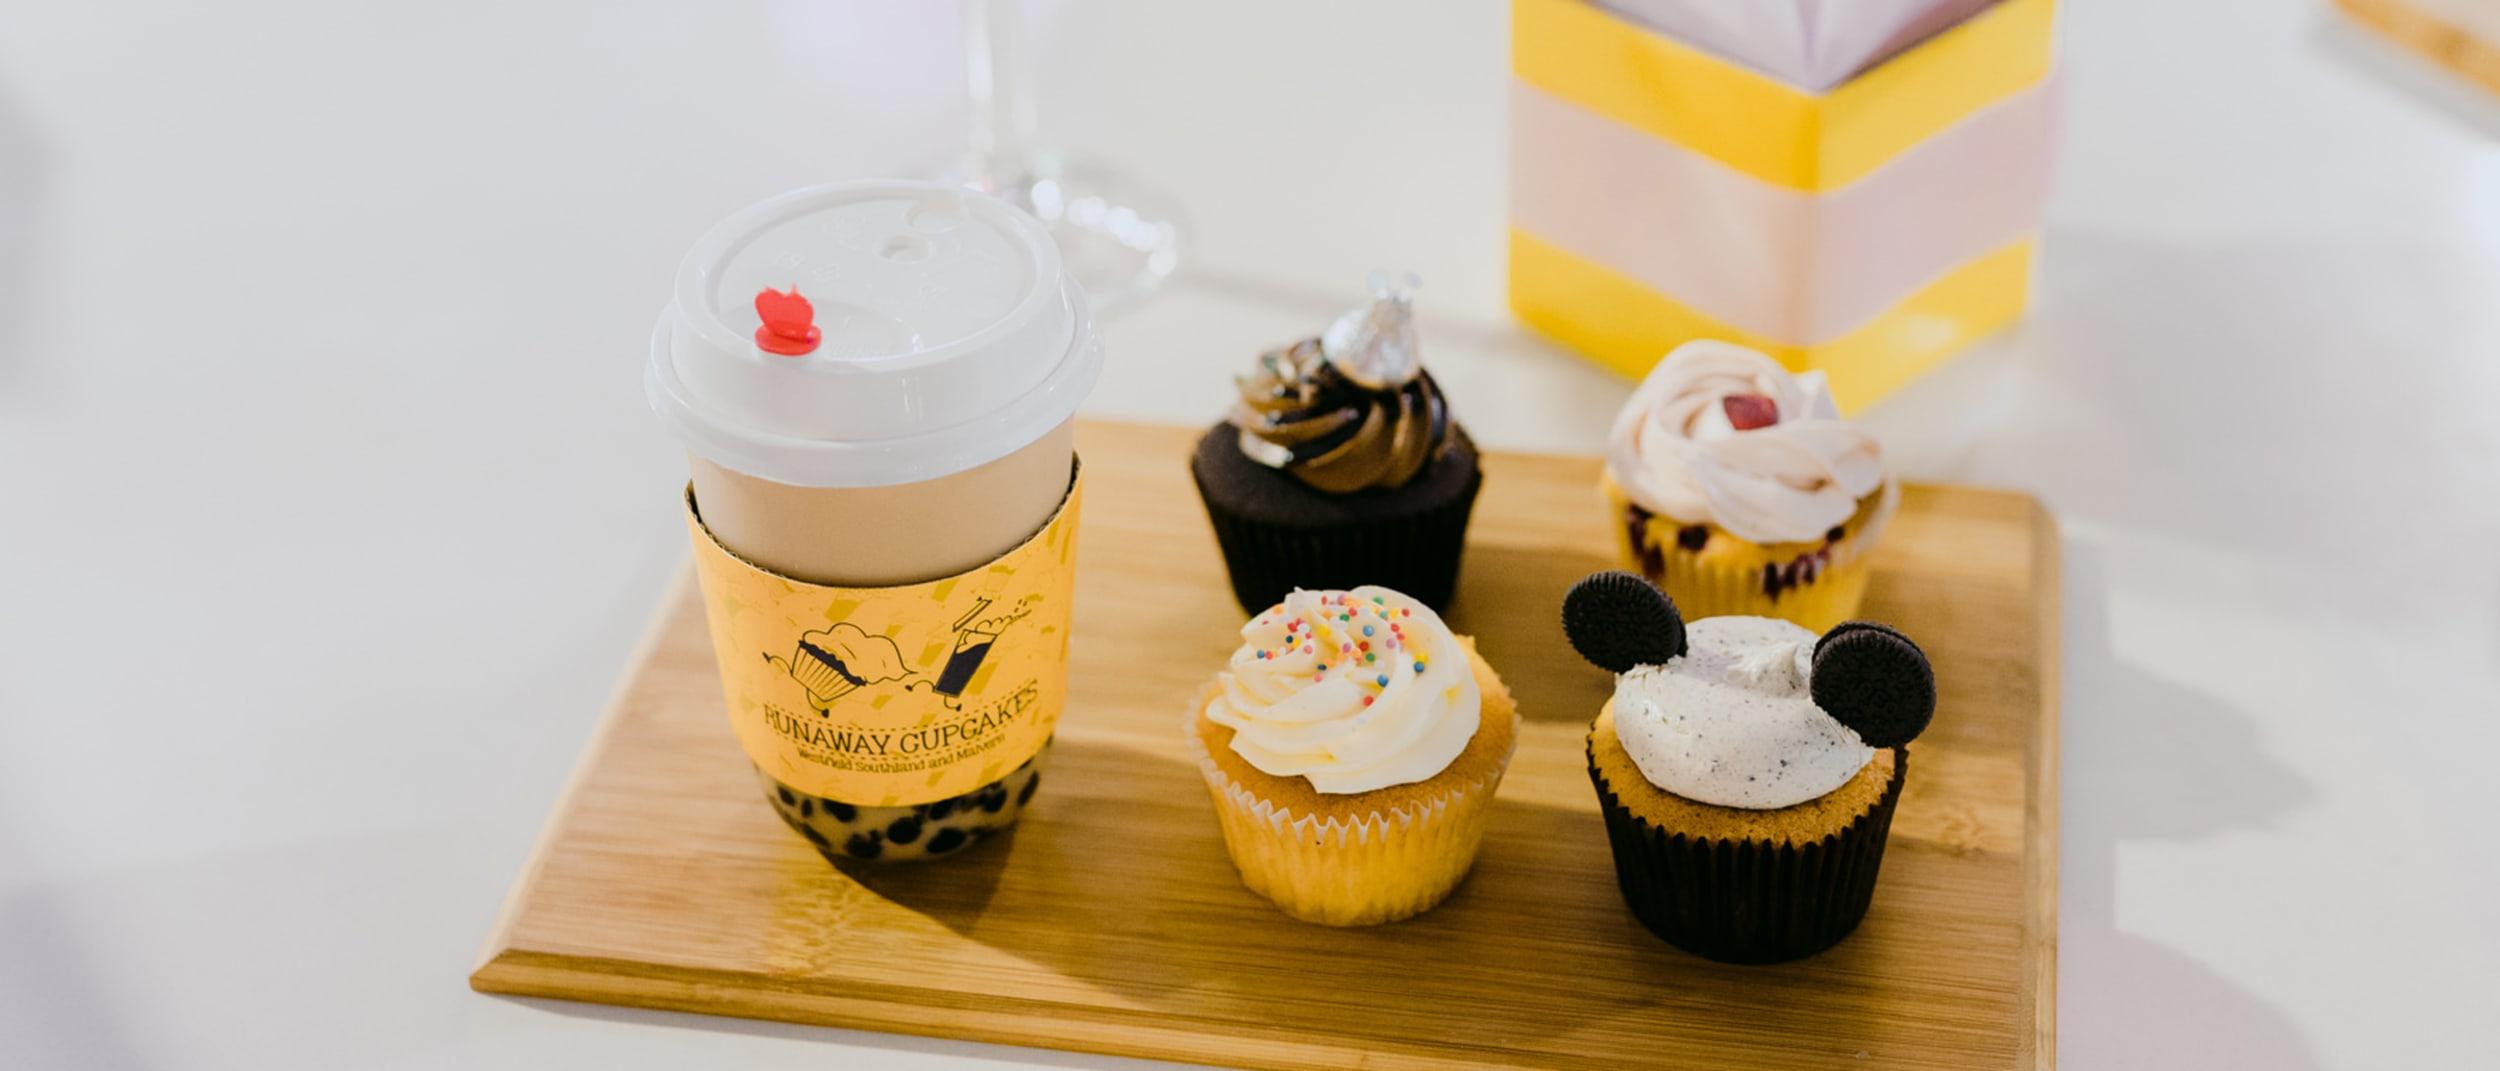 Runaway Cupcakes: free bubble tea